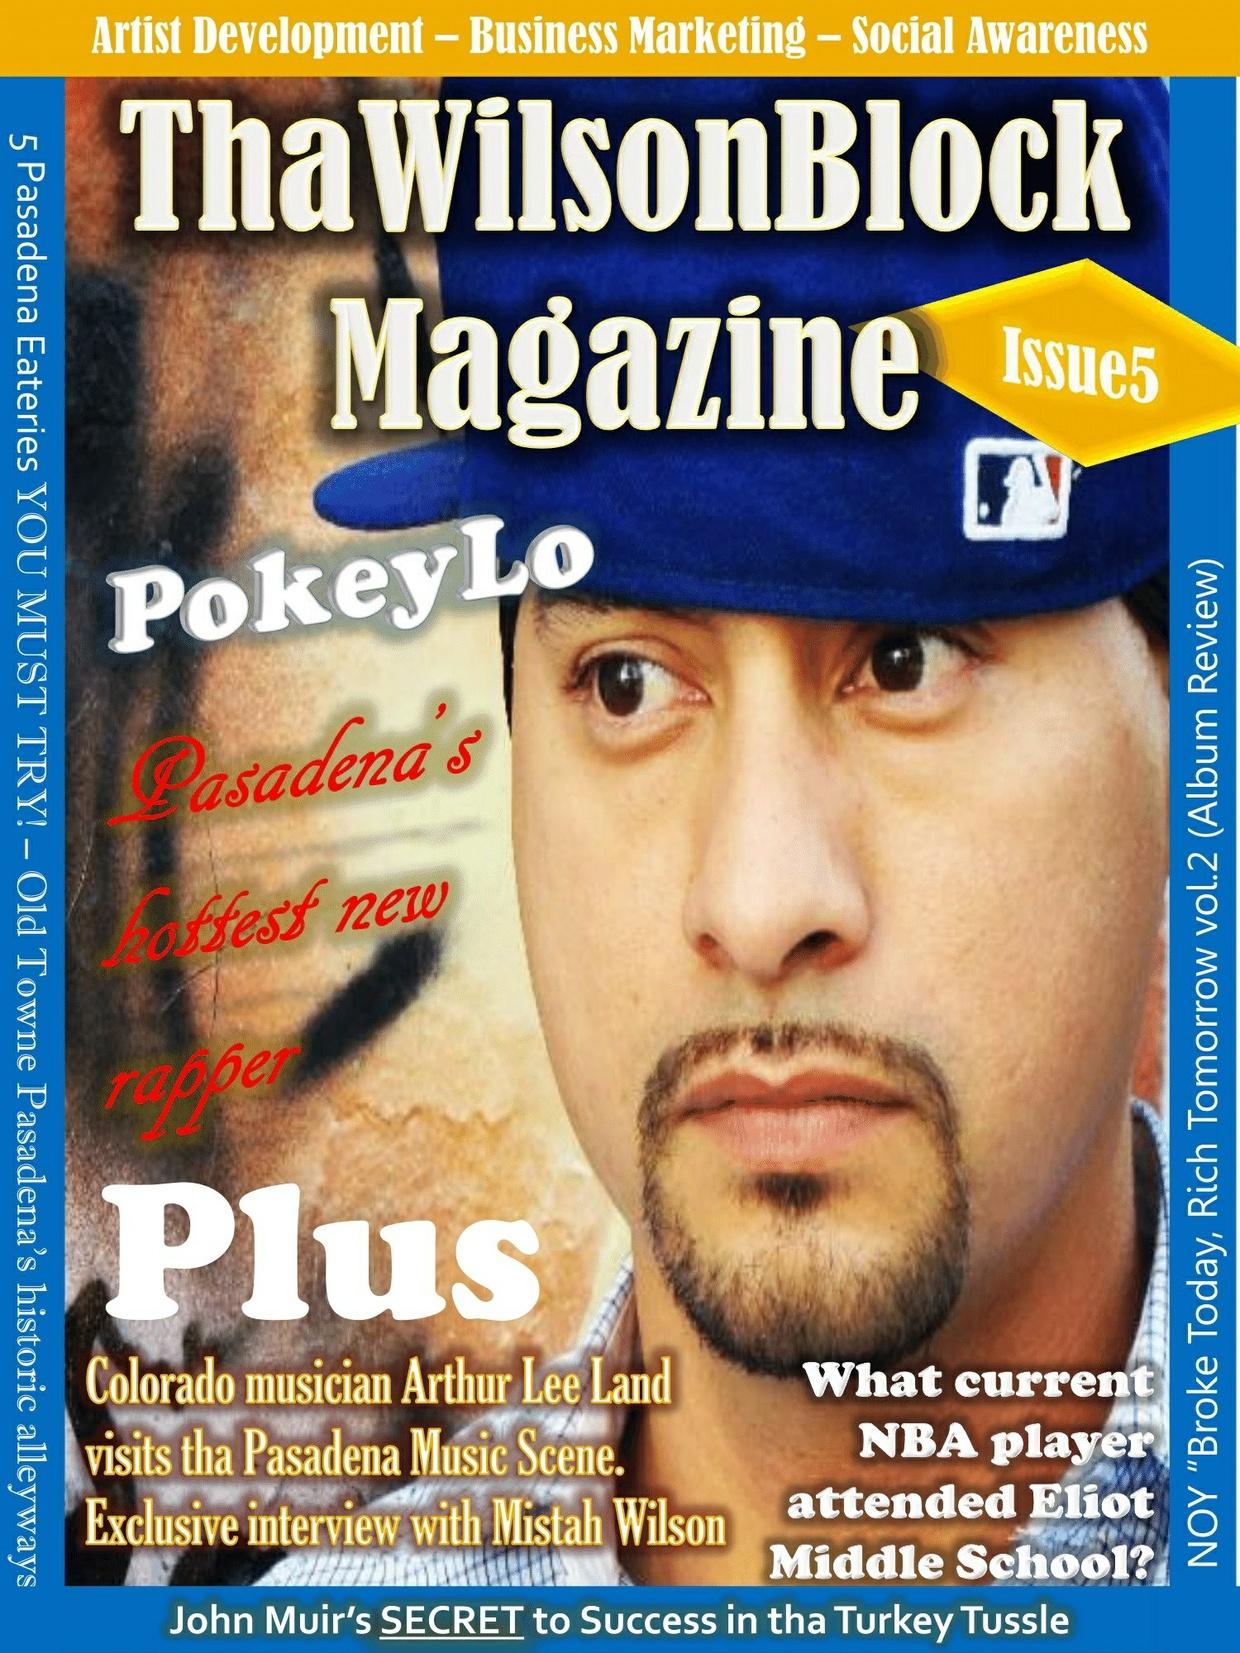 ThaWilsonBlock Magazine Issue5